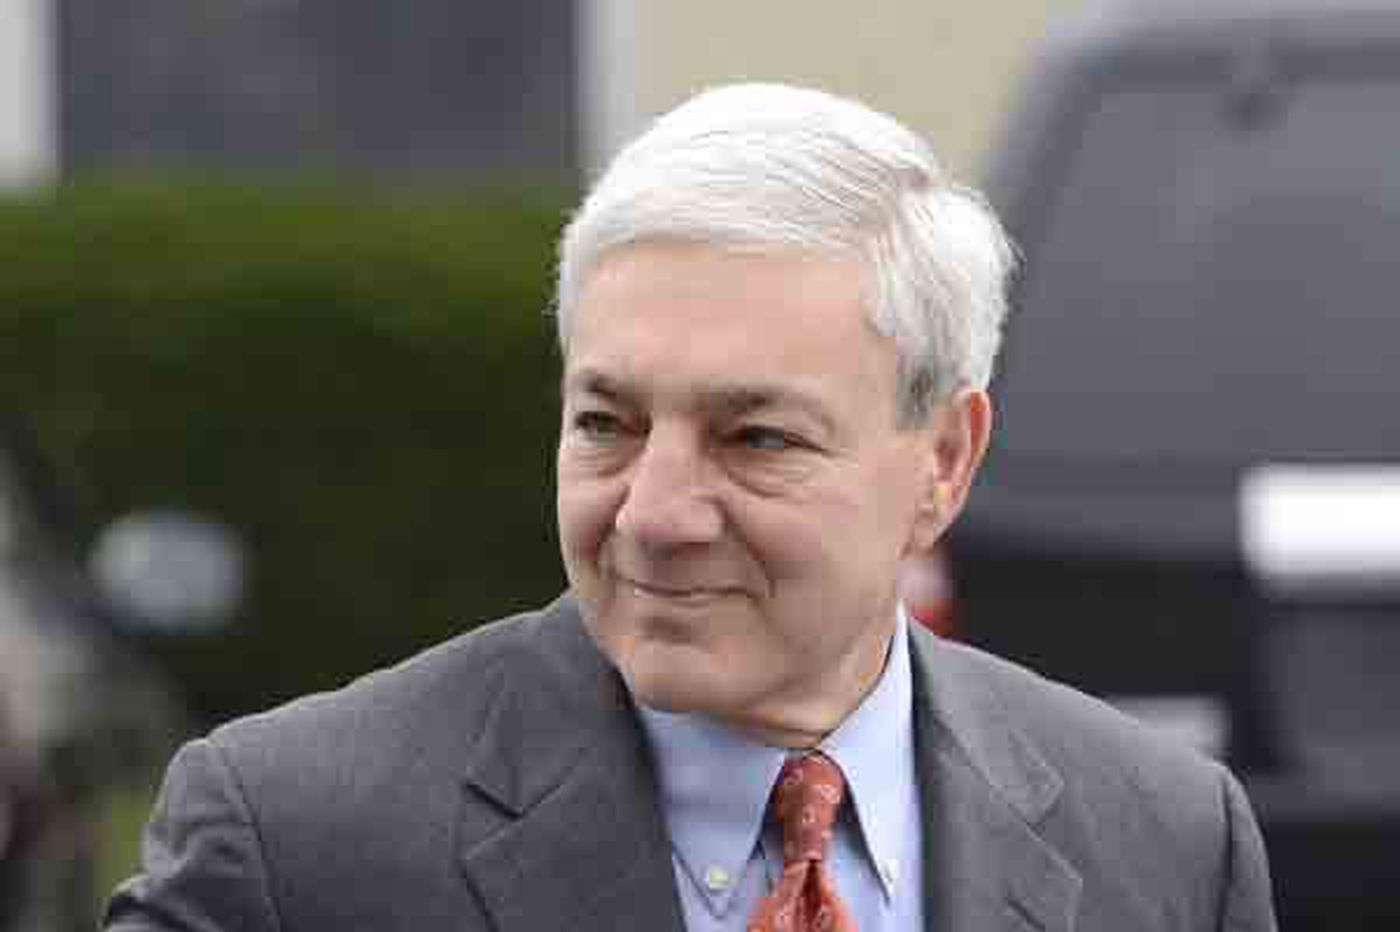 Spanier sues prosecutors, seeks dismissal of case